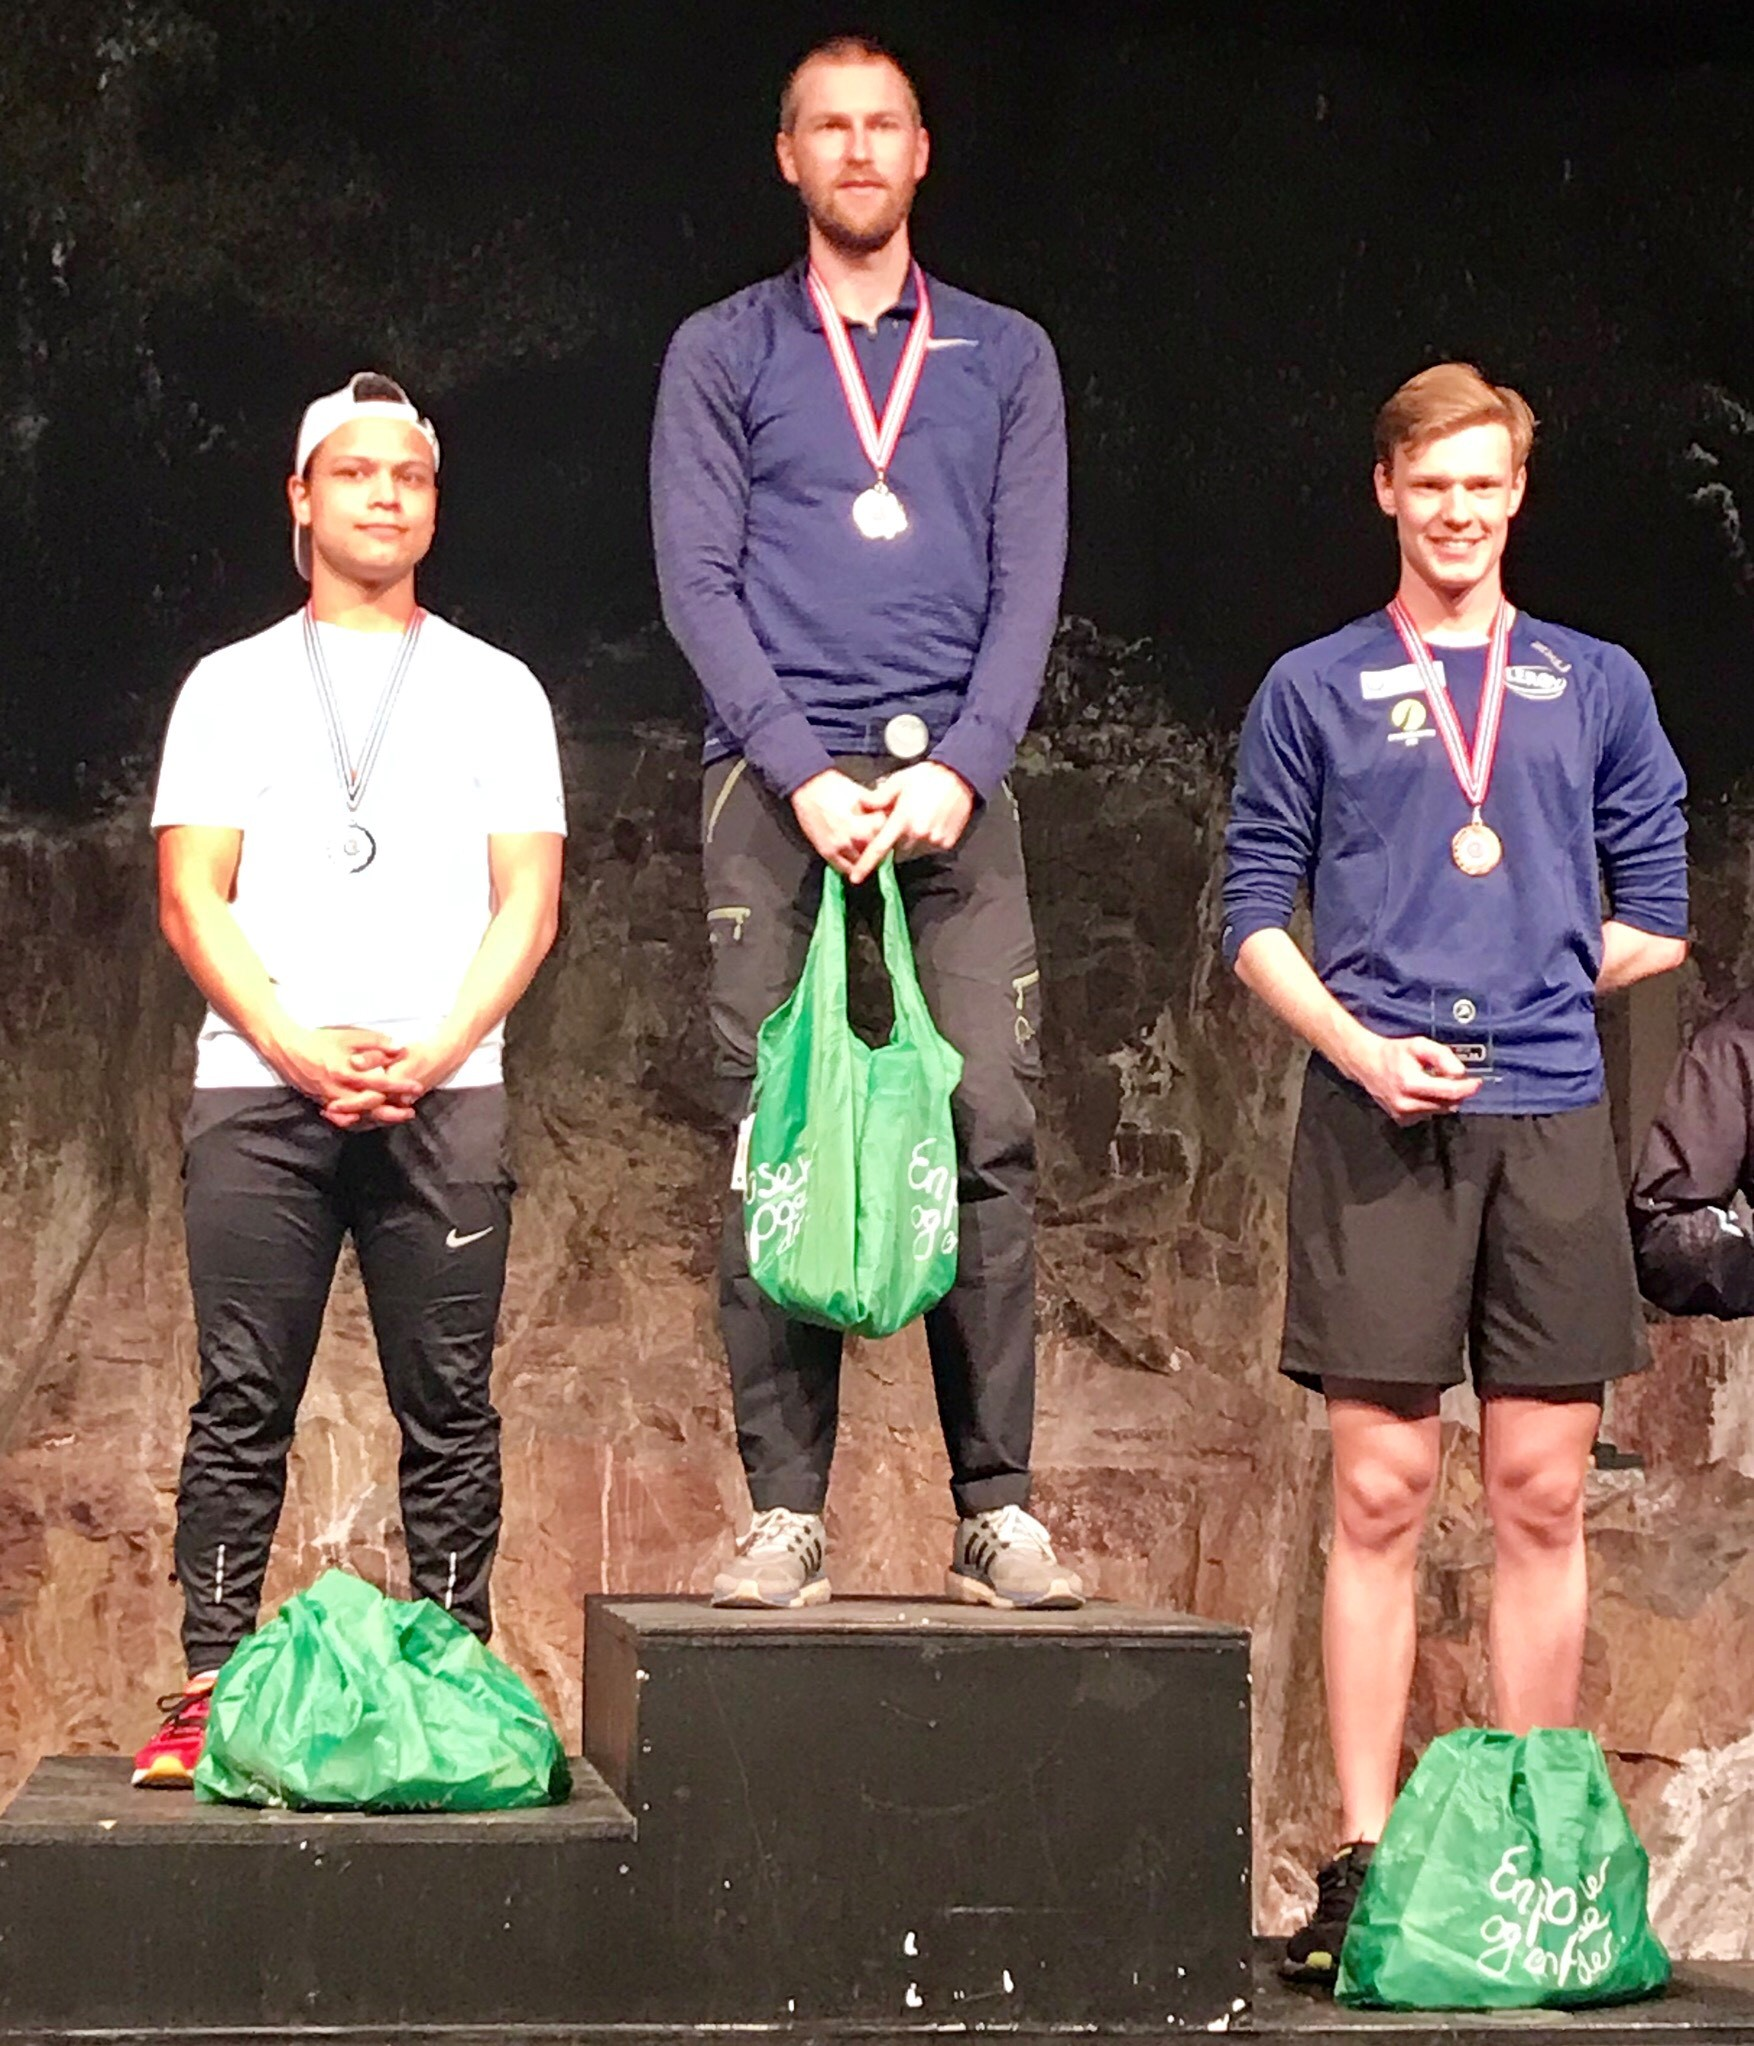 Seierspallen for senior: Fra venstre Mii Erik Haugård (ASK), Einar Agdestein (Asker) og Thomas Lande Eriksen (ASK).